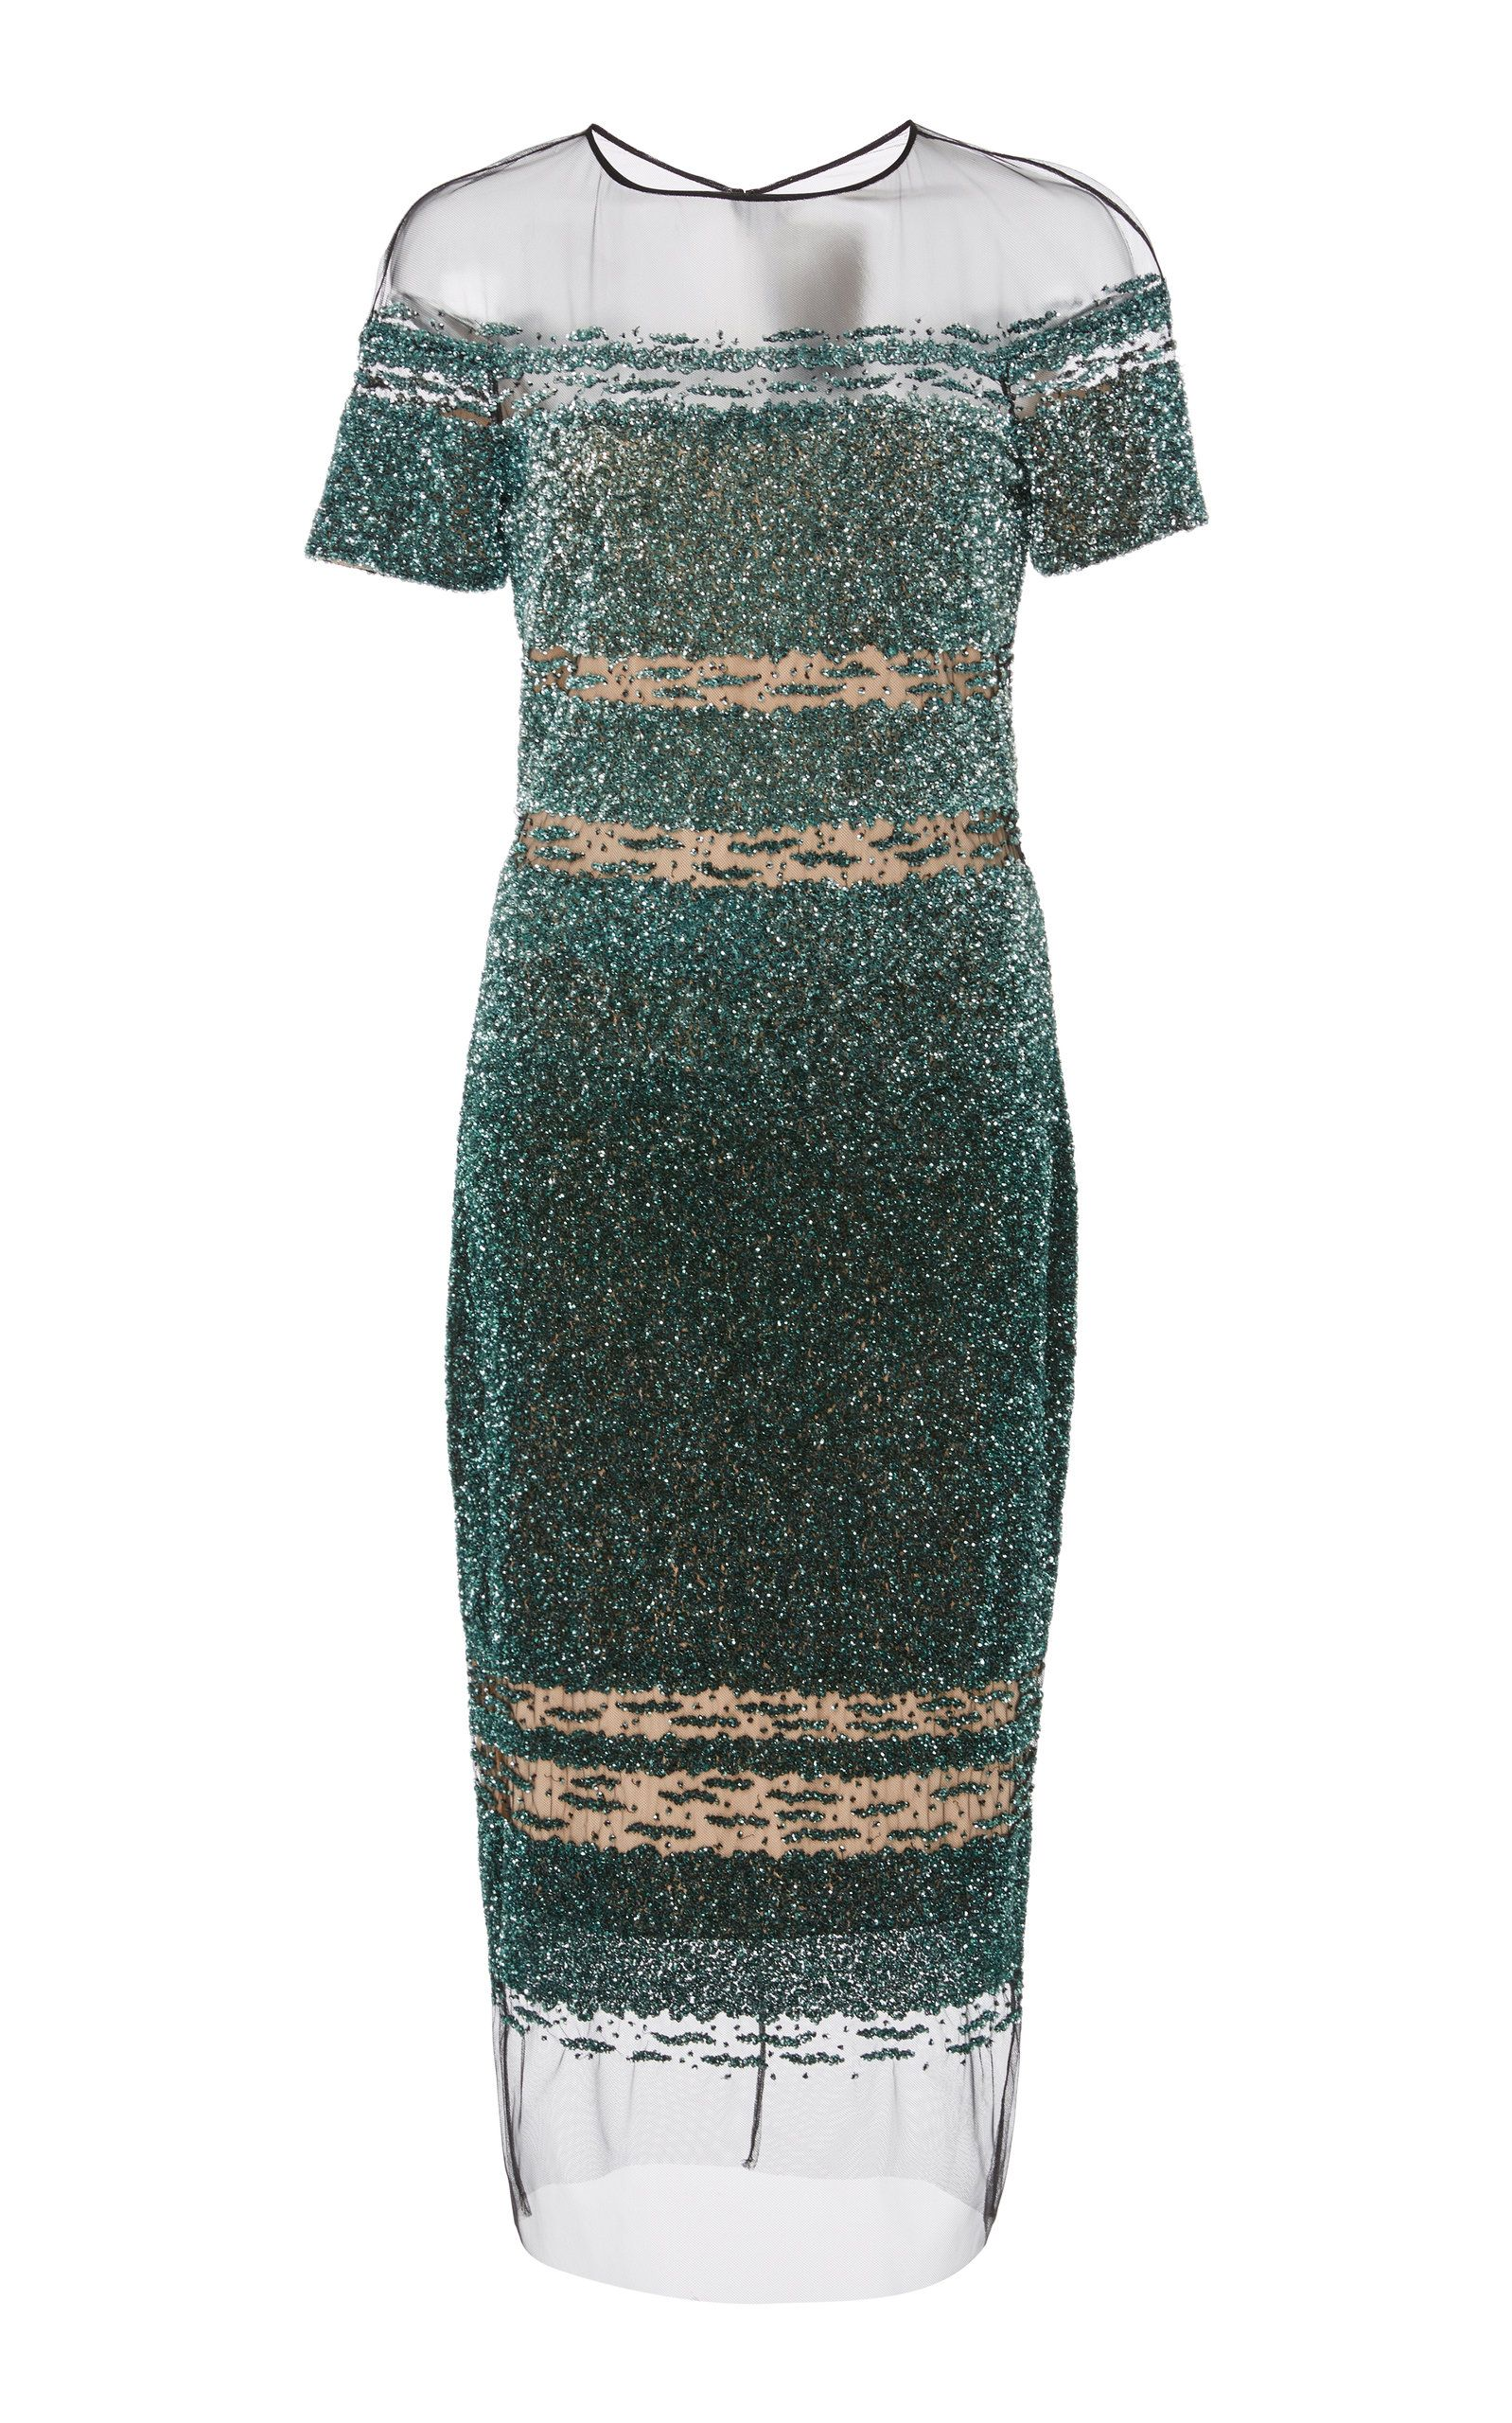 e38bc593866dc Signature Sequin Sheer Hem Dress by PAMELLA ROLAND Lace Skirt, Stripes,  Neckline, Short